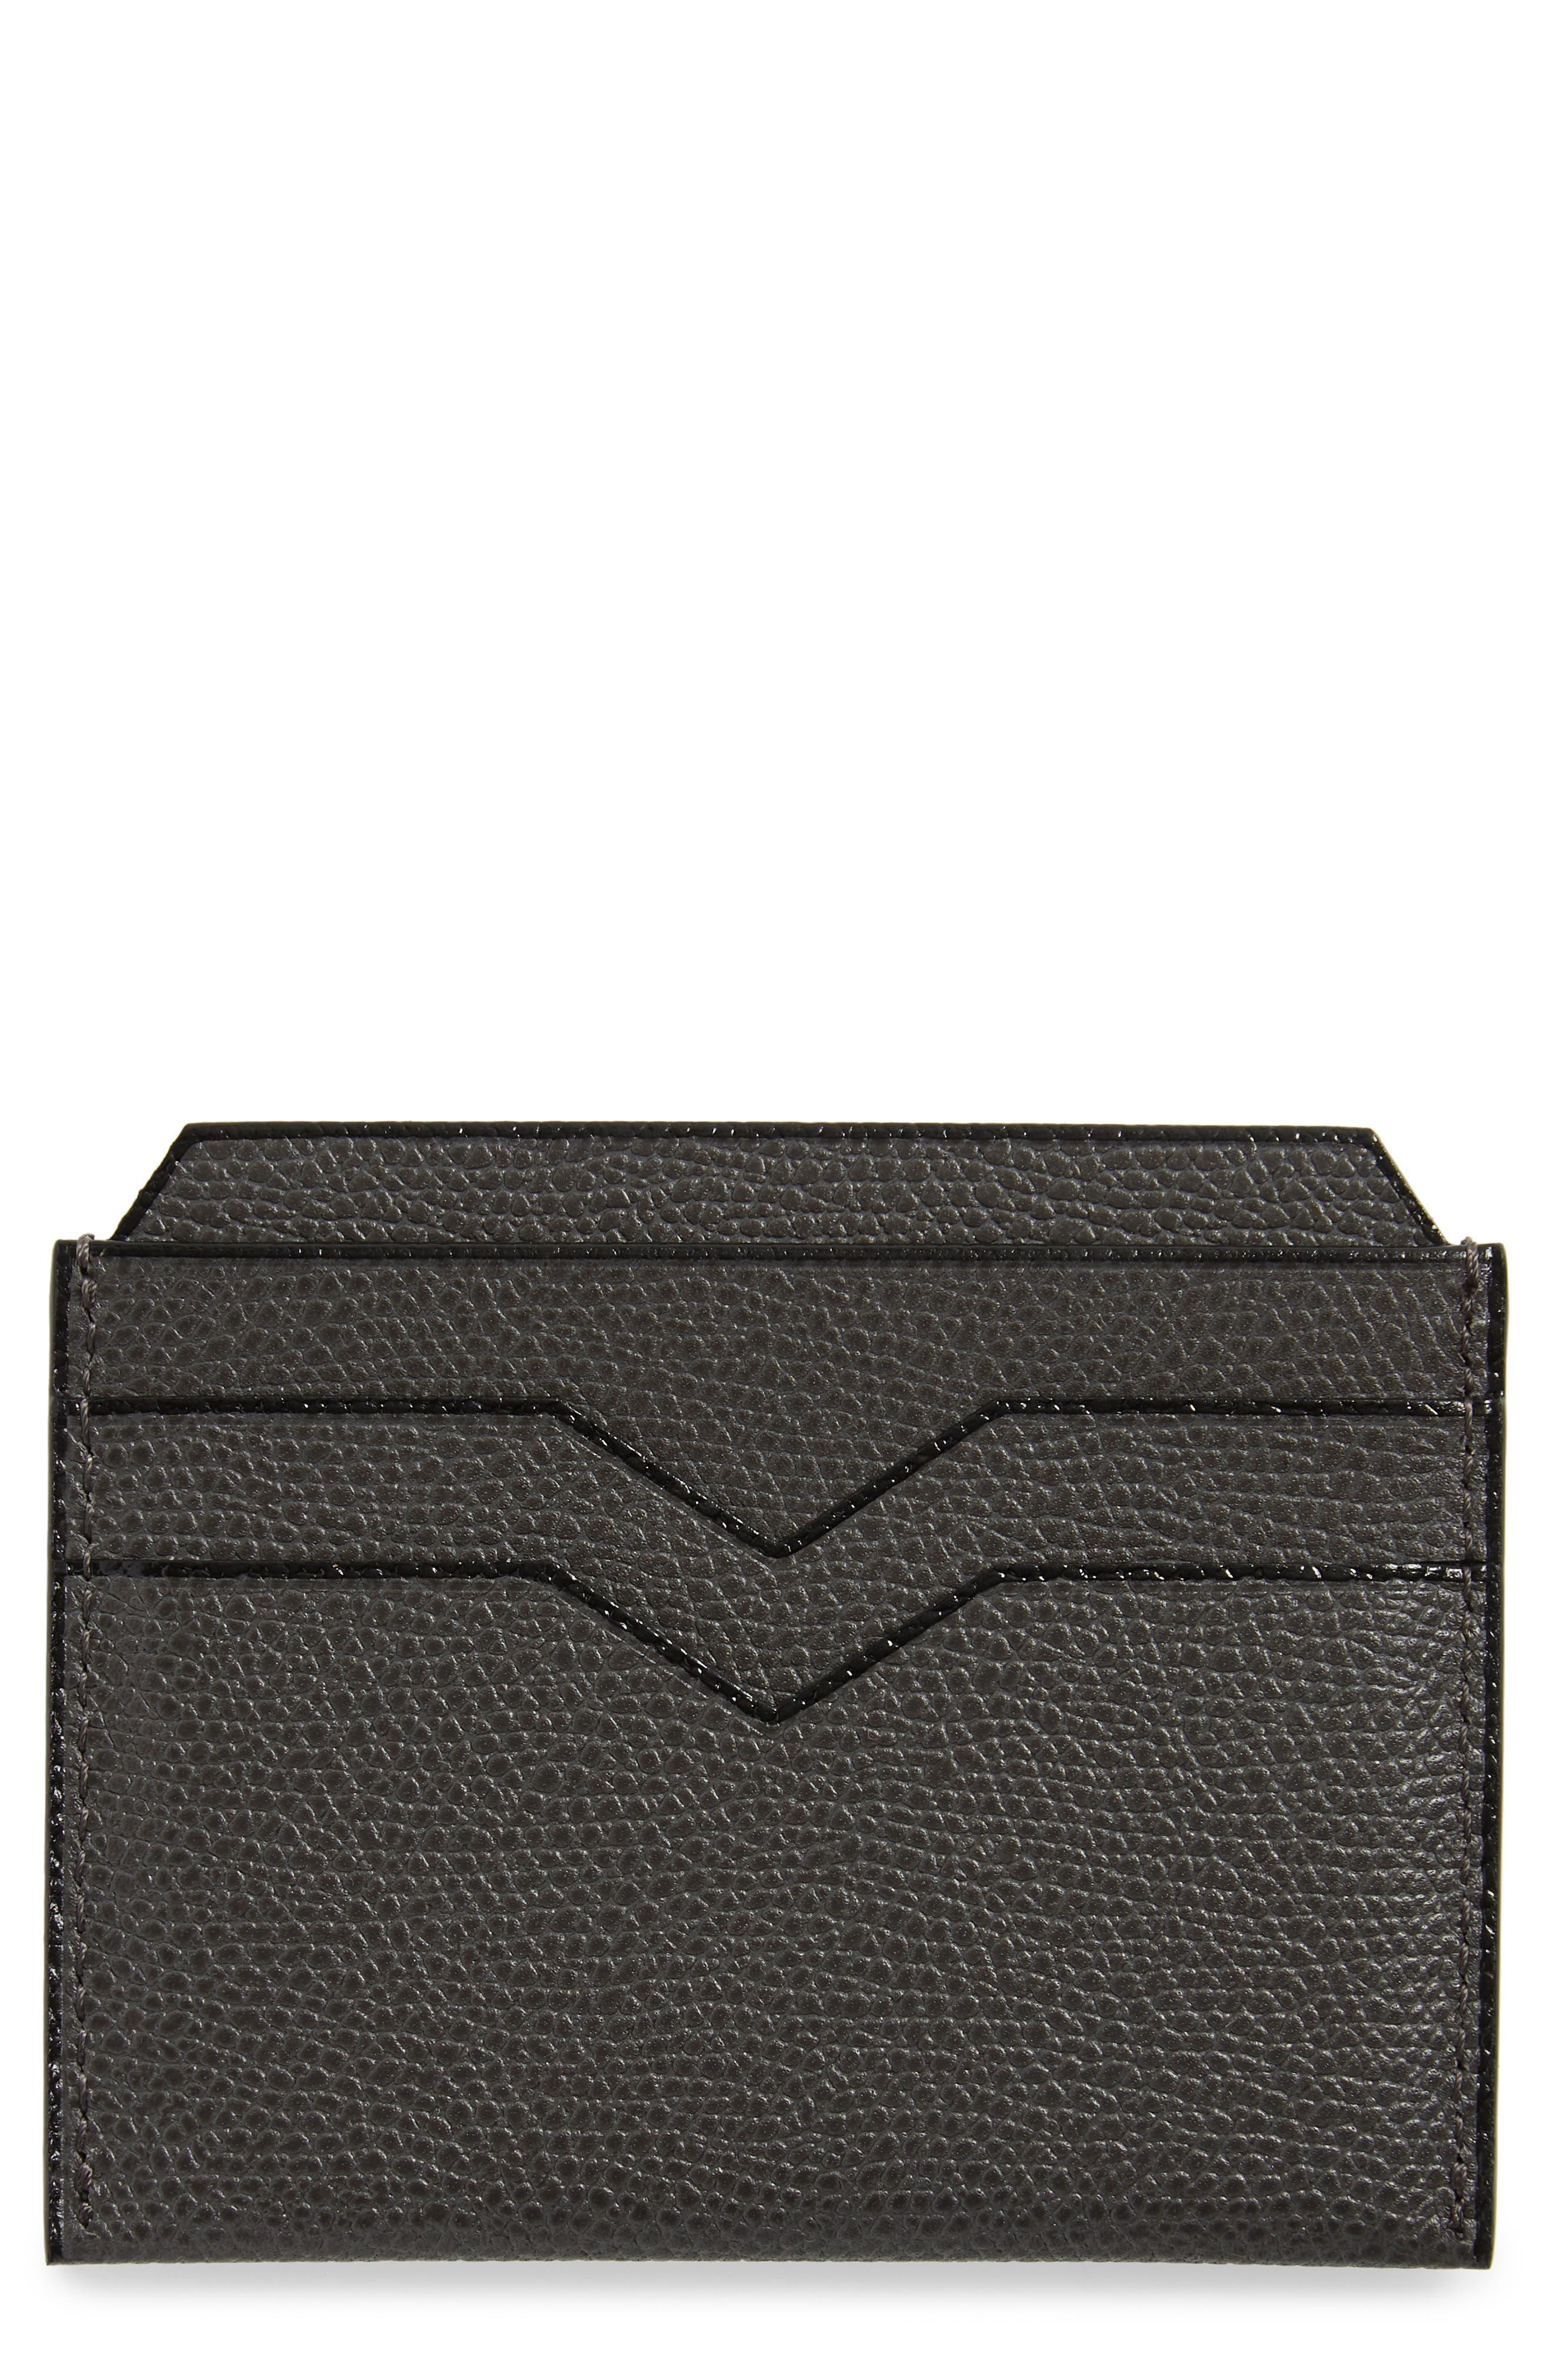 Leather Card Case,                             Main thumbnail 1, color,                             FUMO DI LONDRA